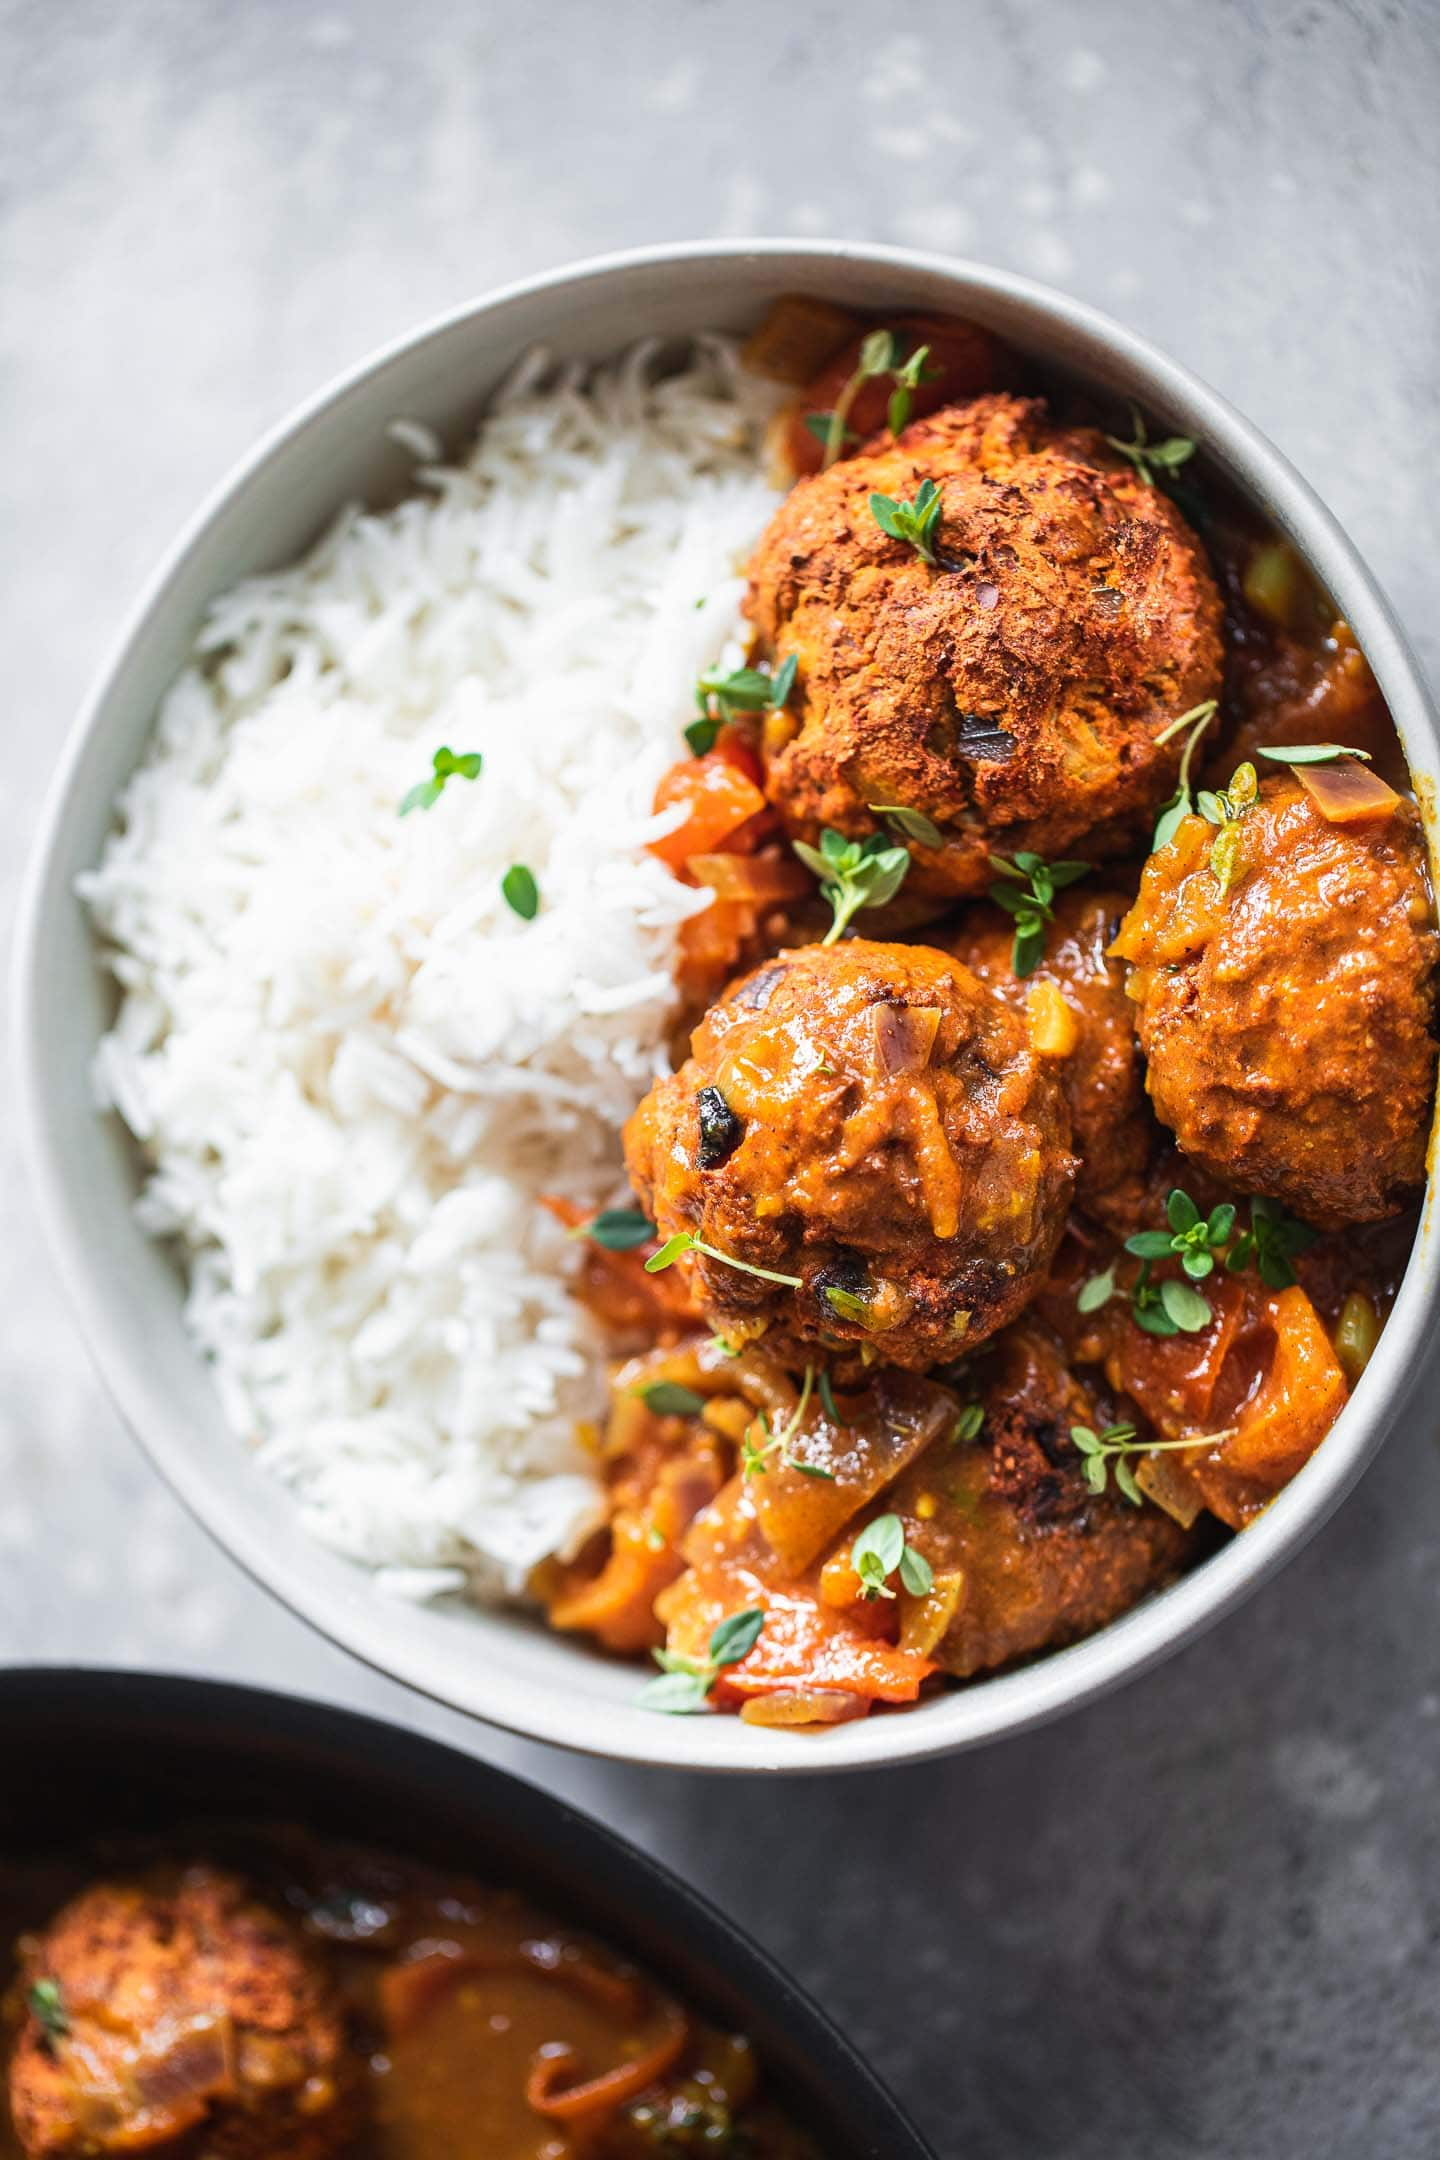 Rice and vegan meatballs